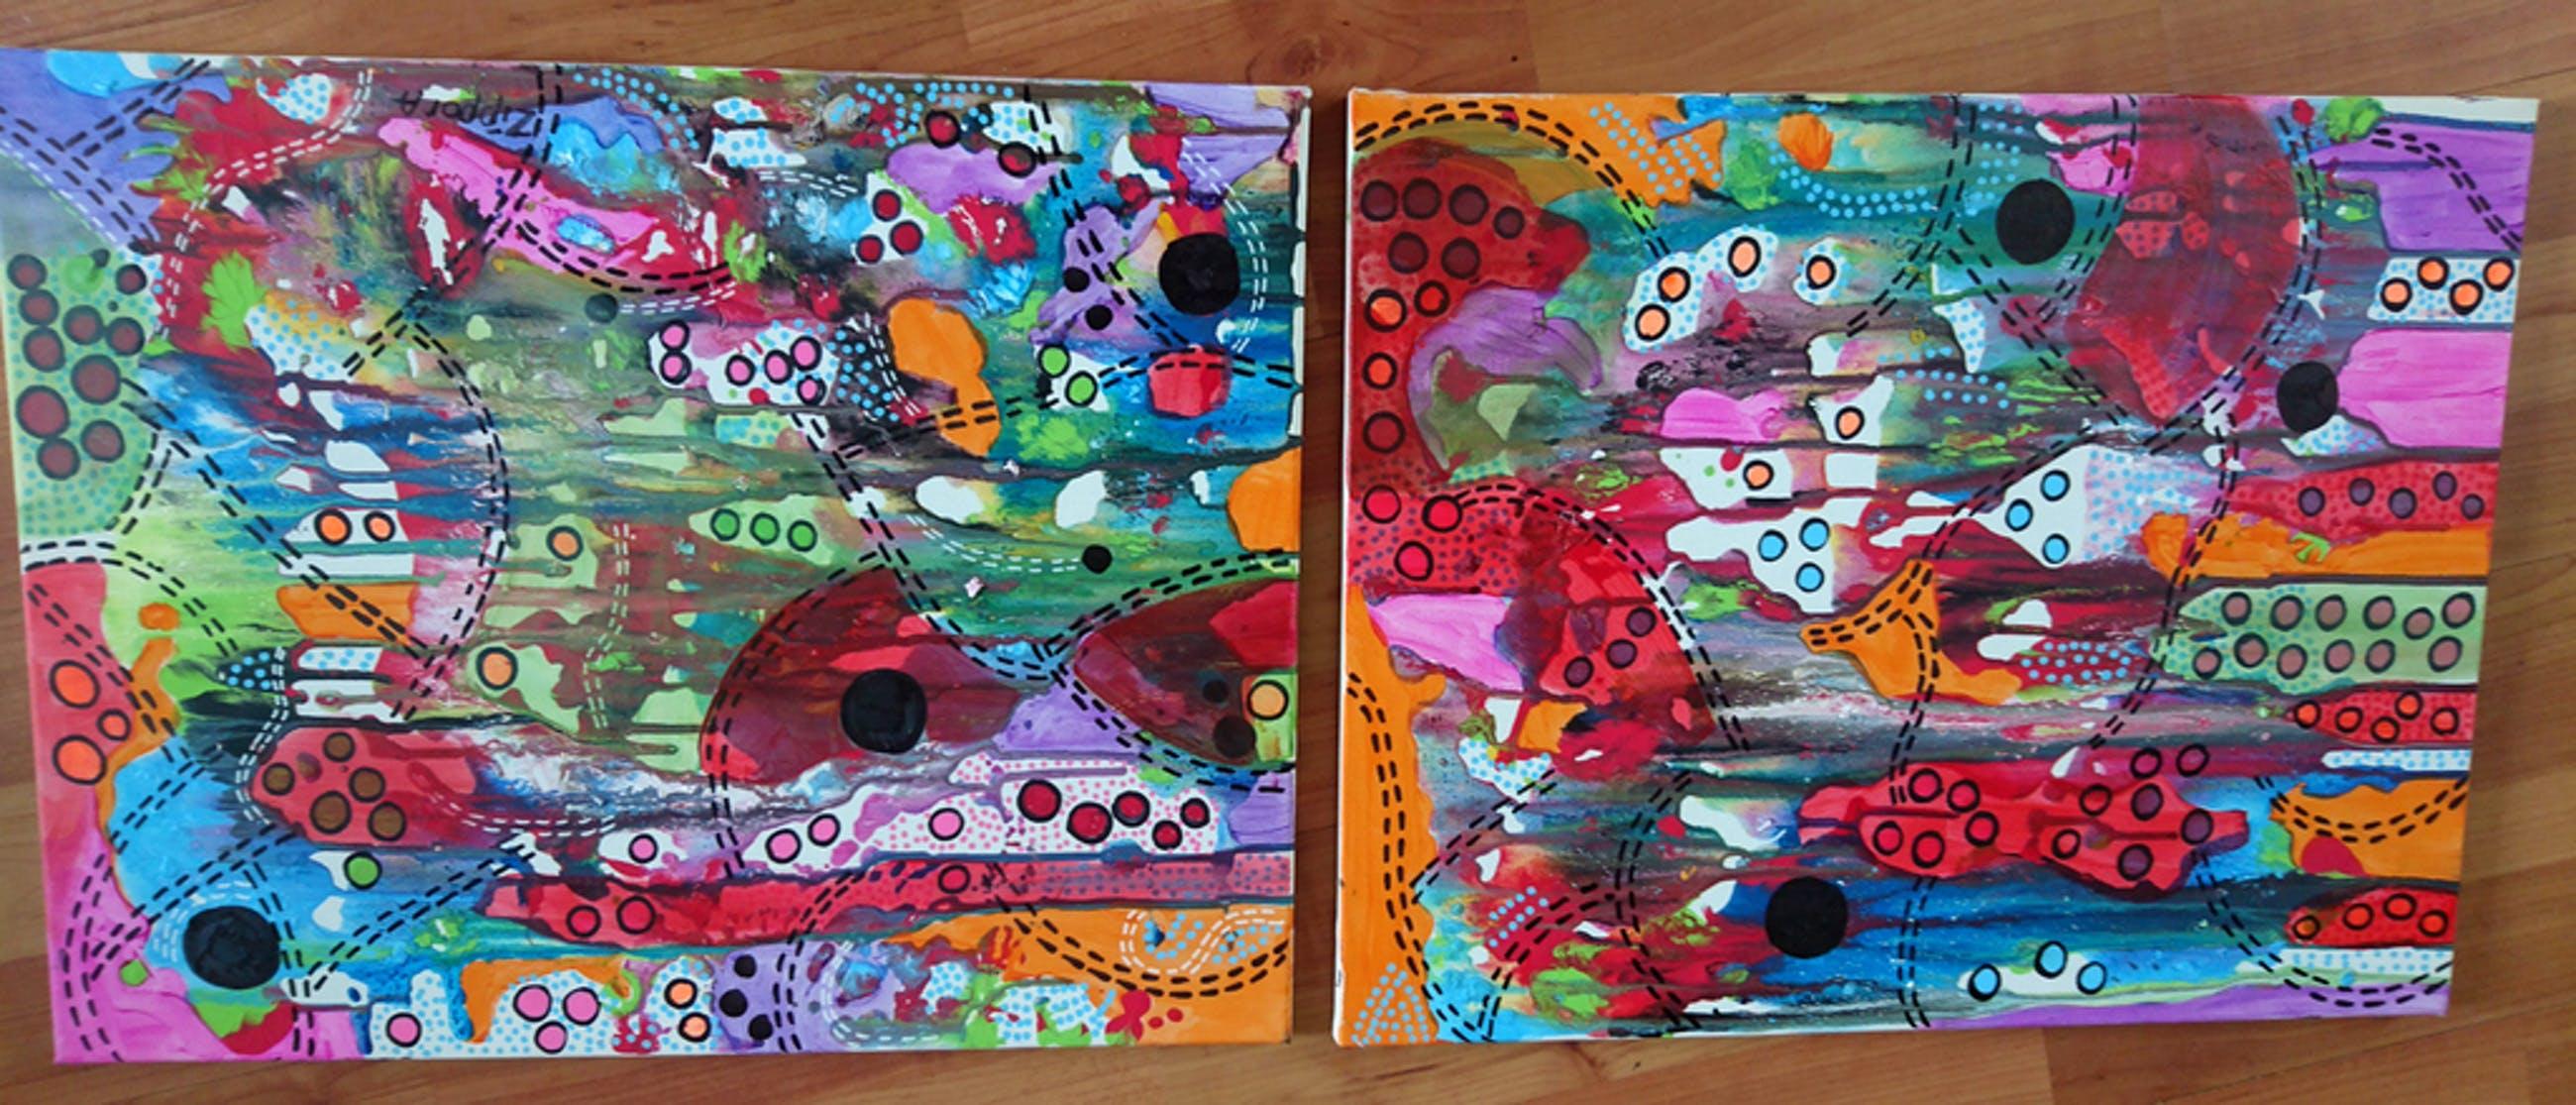 Zippora Meijer  Turn From Negative To Positive  Acryl op canvas 2x 40x50 cm kopen? Bied vanaf 1!